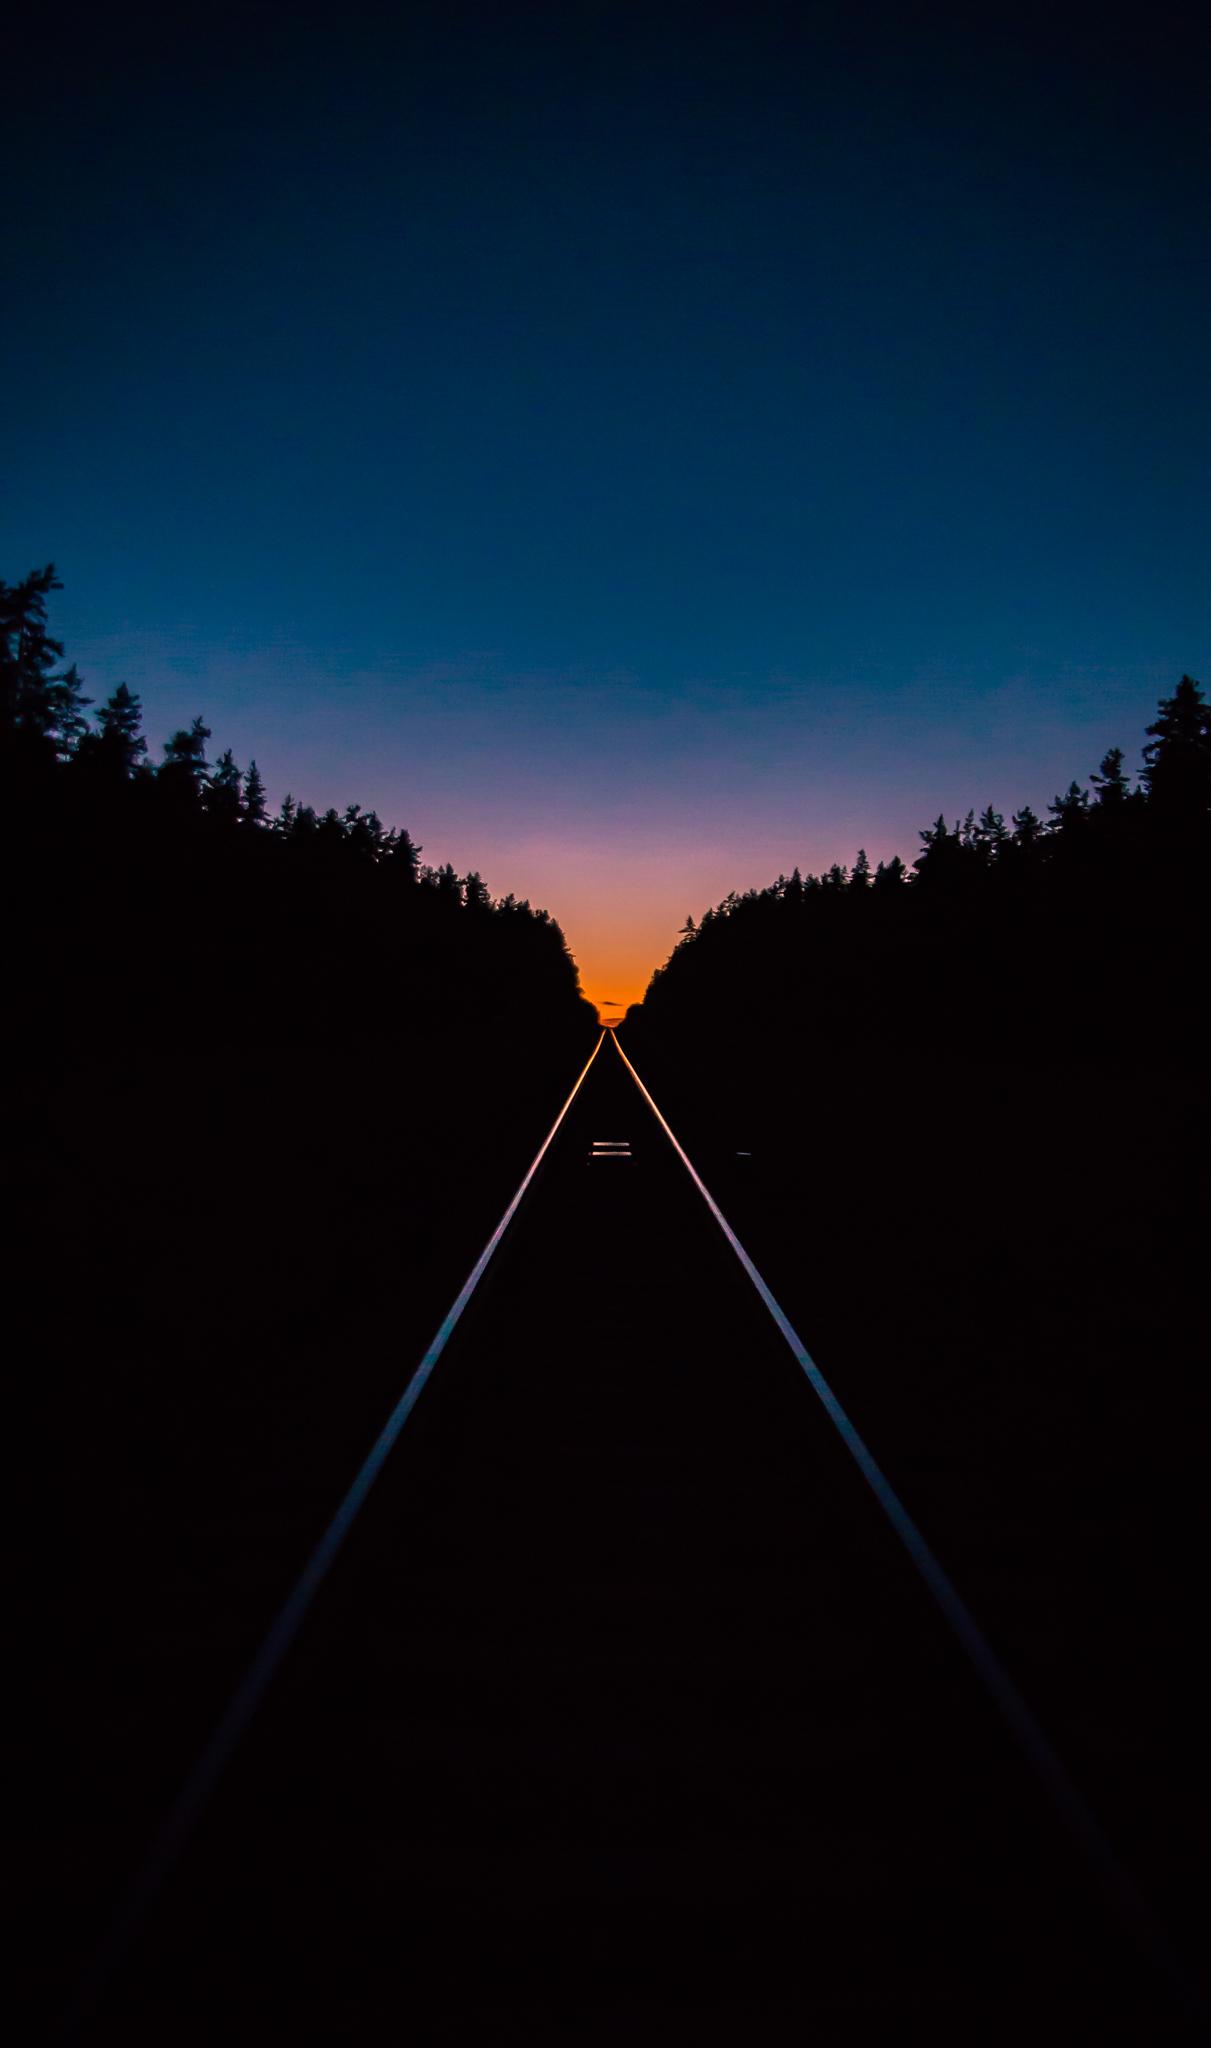 This evening railway - Imgur